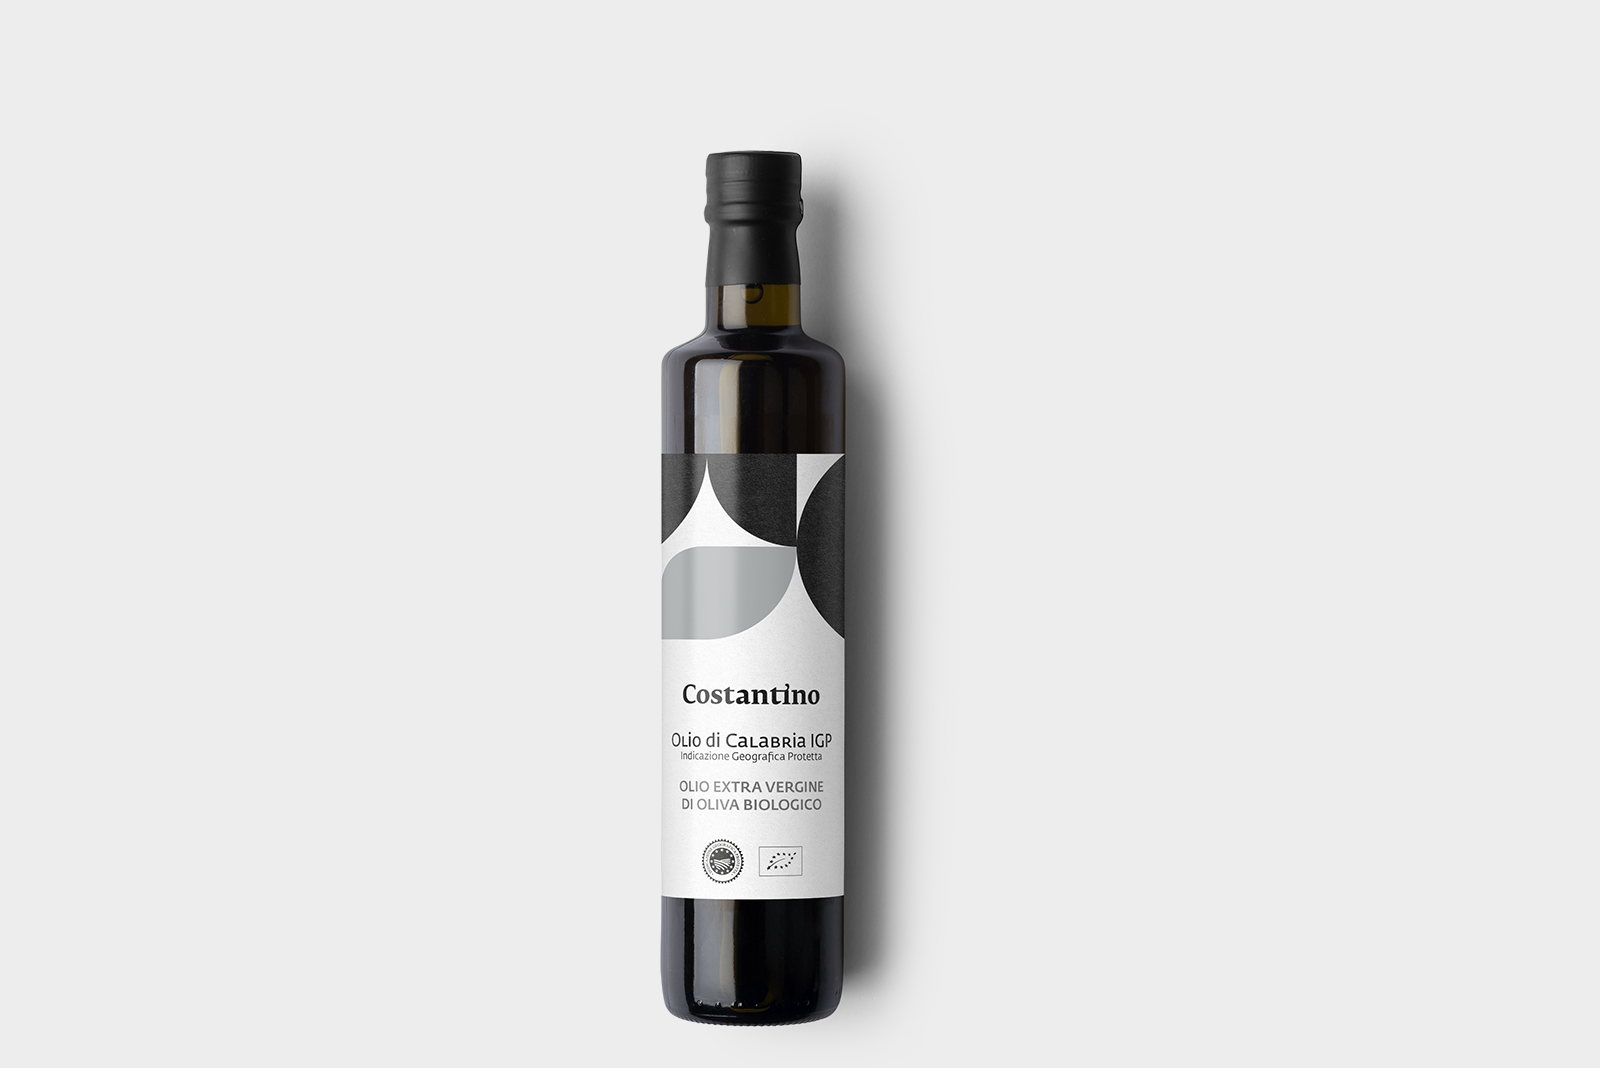 Costantino - Olio Extra Vergine d'Oliva Biologico IGP Calabria - bottiglia 75cl